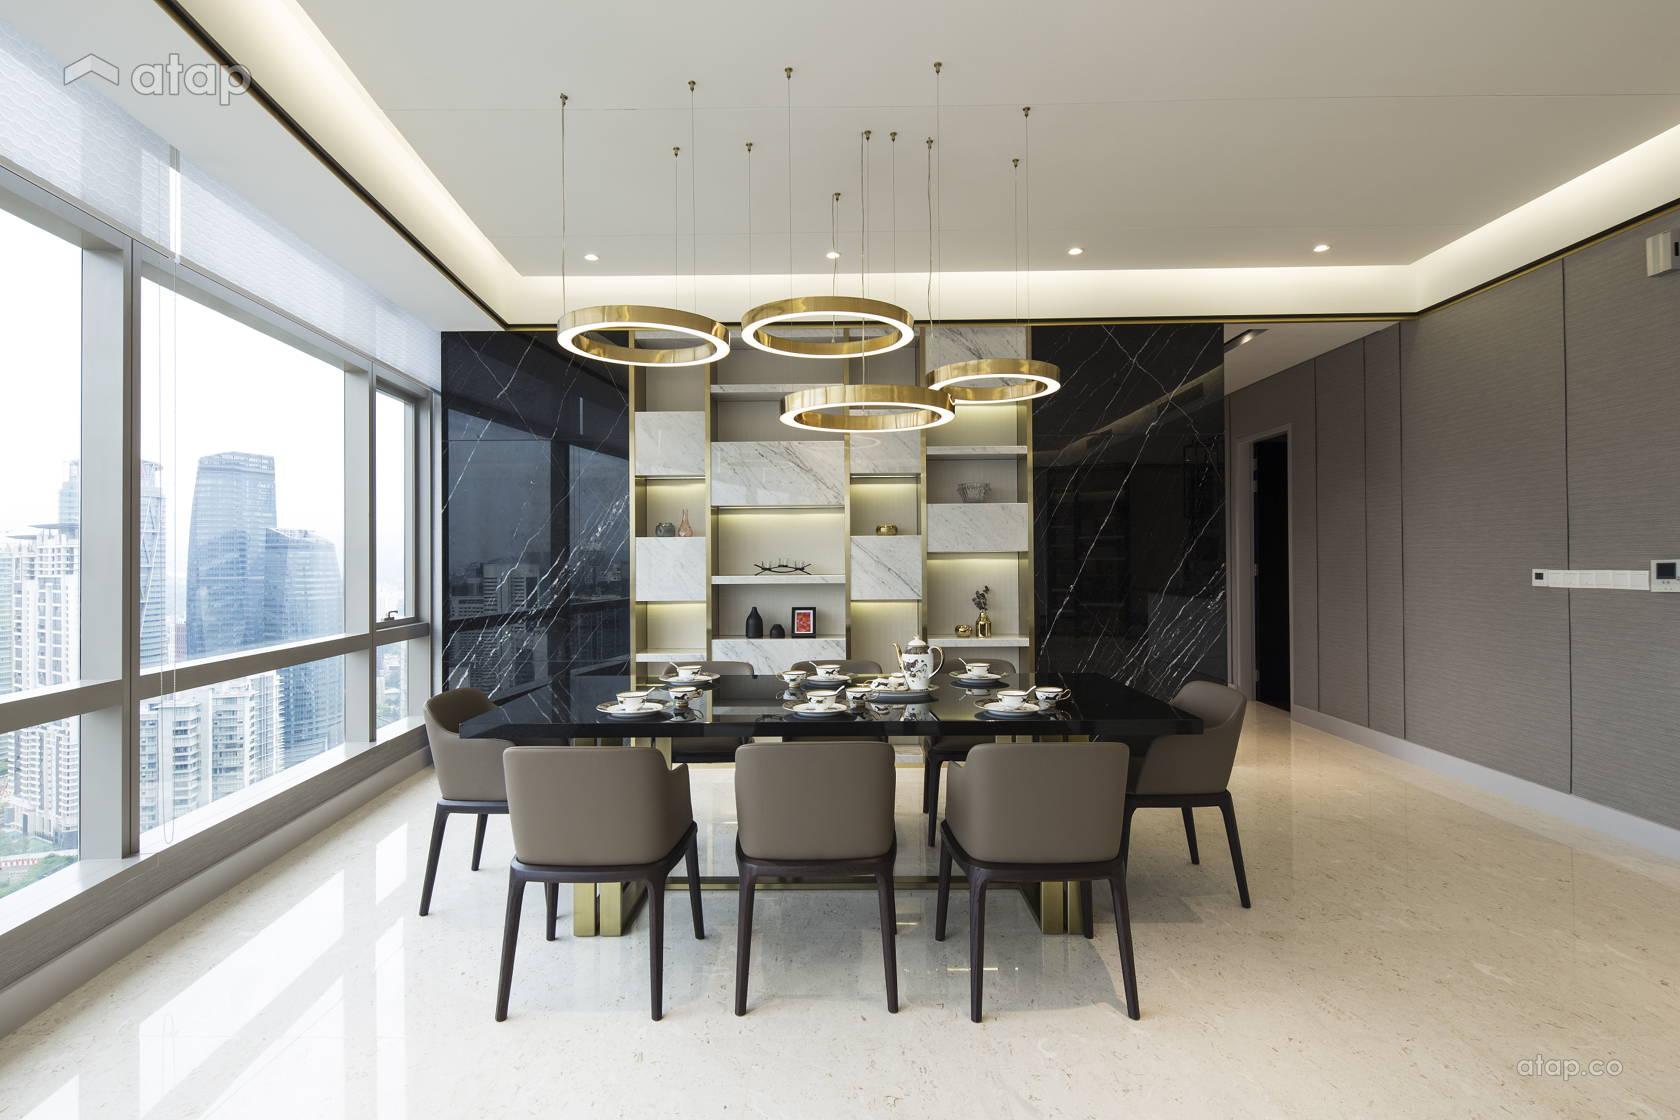 Banyan Tree Signatures Interior Design Renovation Ideas Photos And Price In Malaysia Atap Co